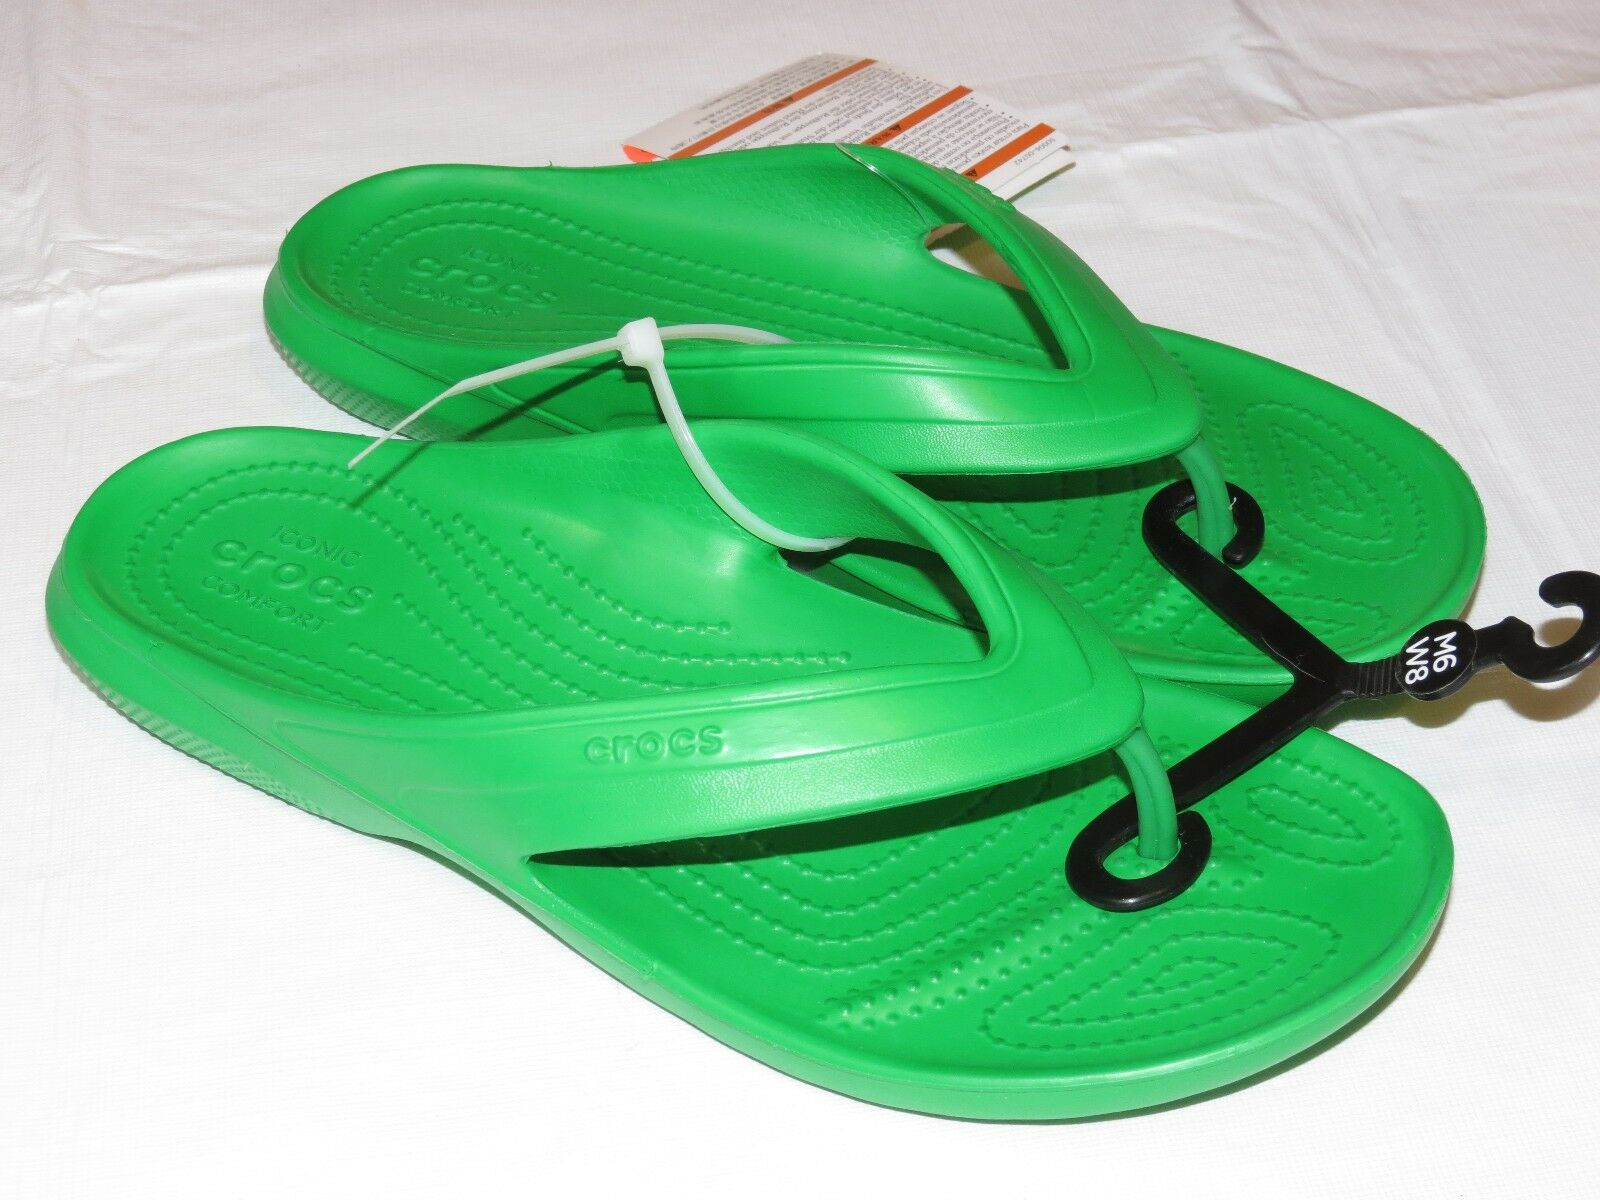 254fa6beb6e3 Buy Crocs Classic Flip Grass Green Relaxed Unisex M 9 W 11 Flip ...